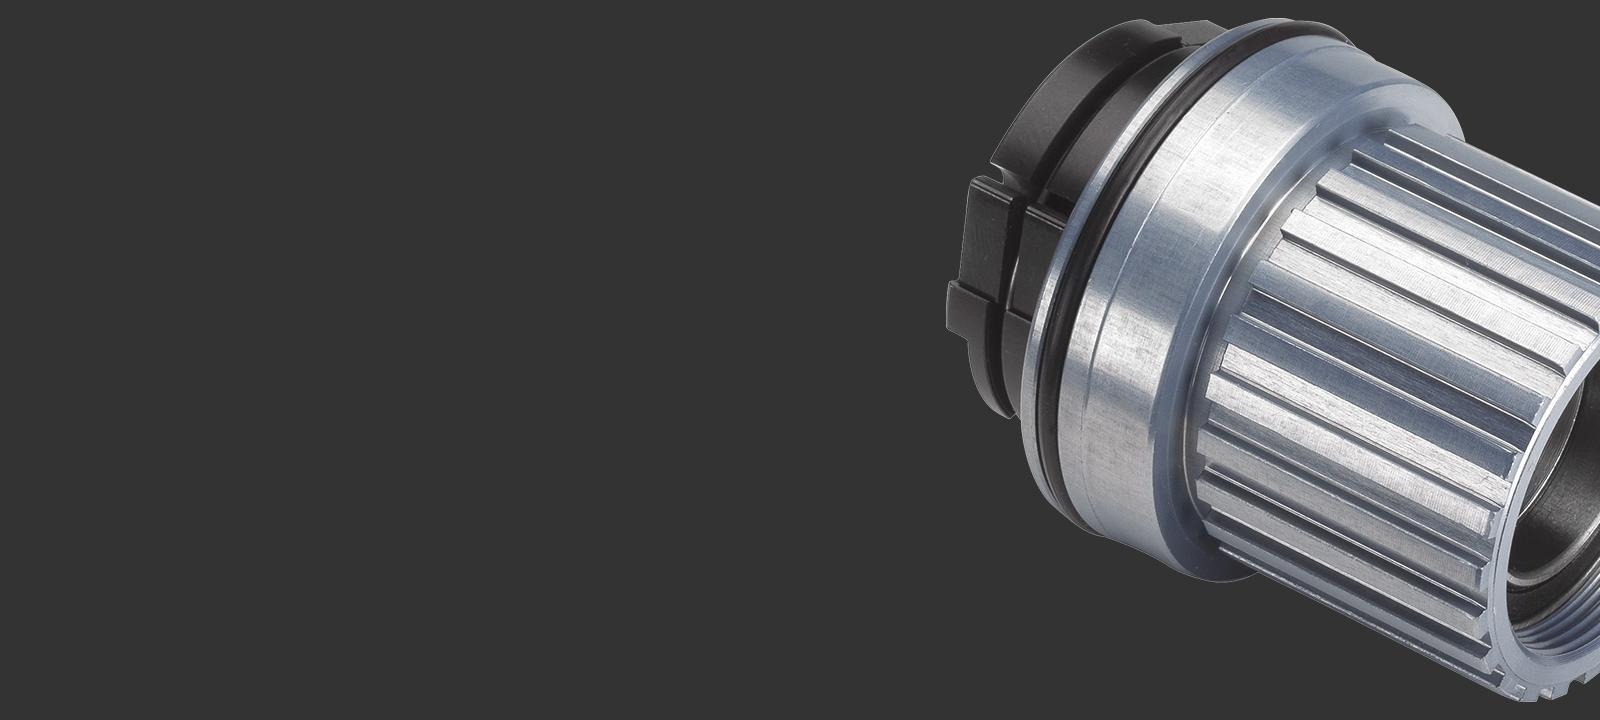 Elite Shimano MicroSpline Freehub Adapter